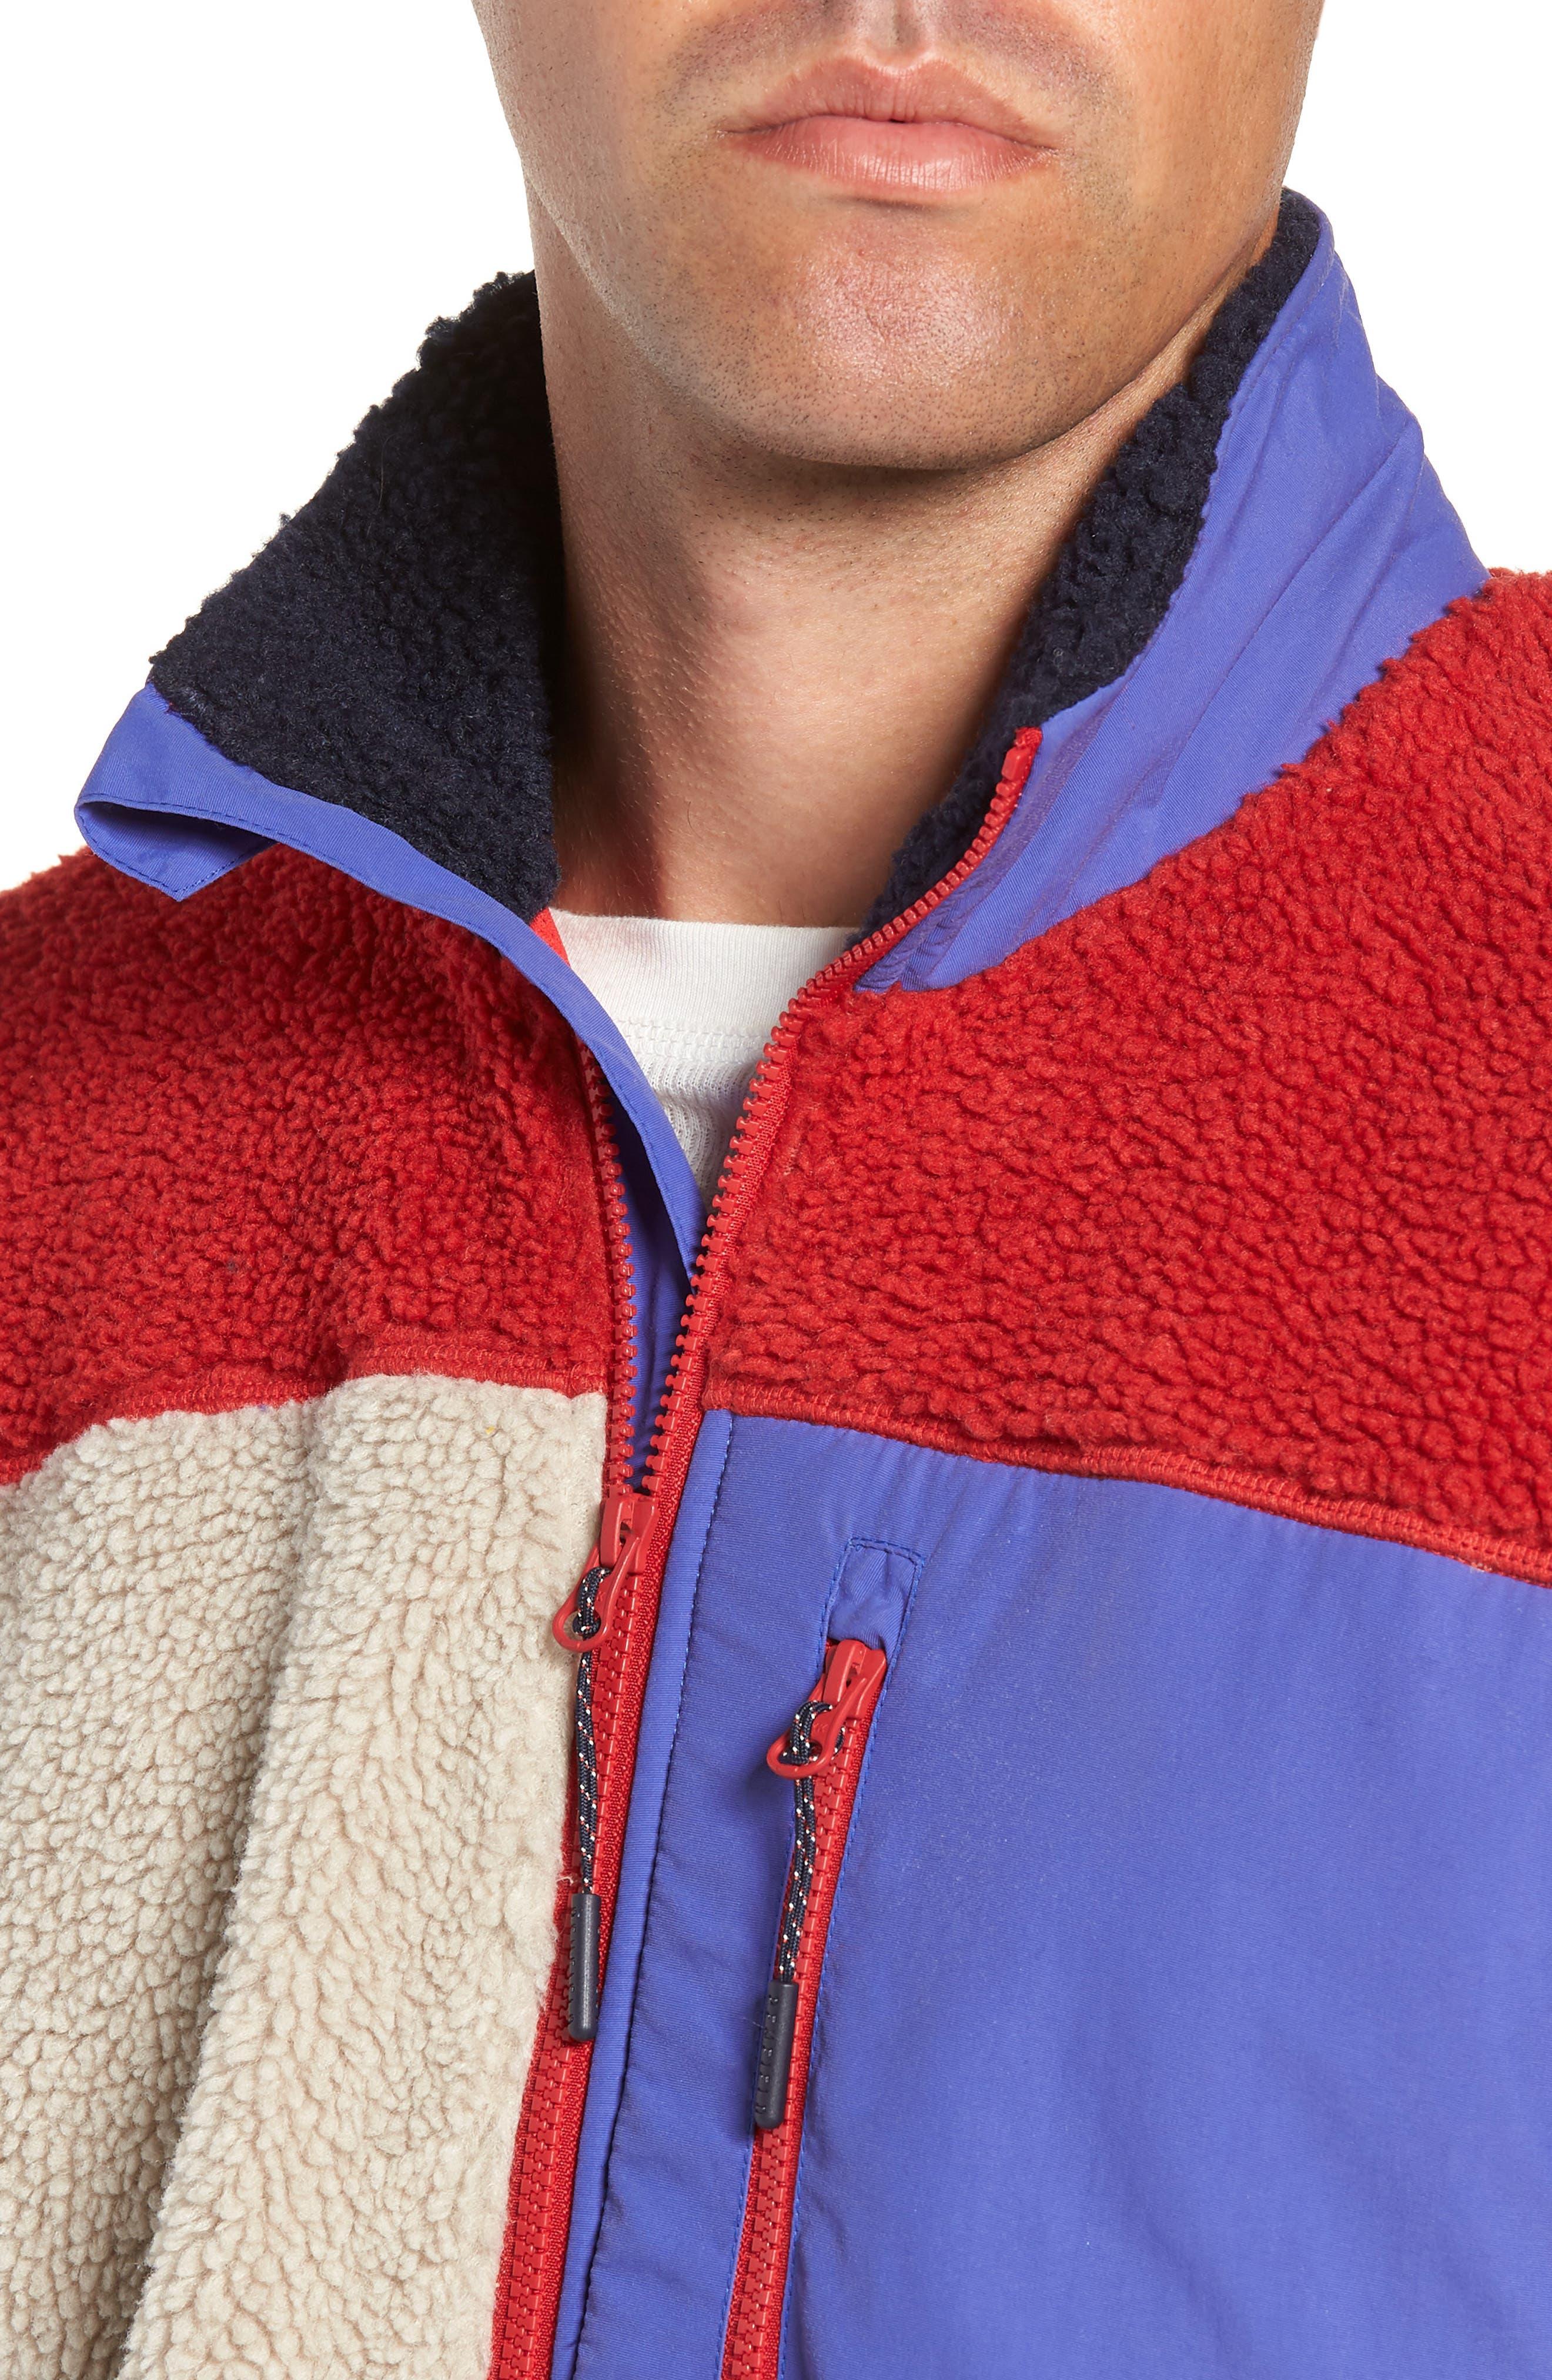 Mattawa Colorblock Fleece Zip Jacket,                             Alternate thumbnail 4, color,                             TAN